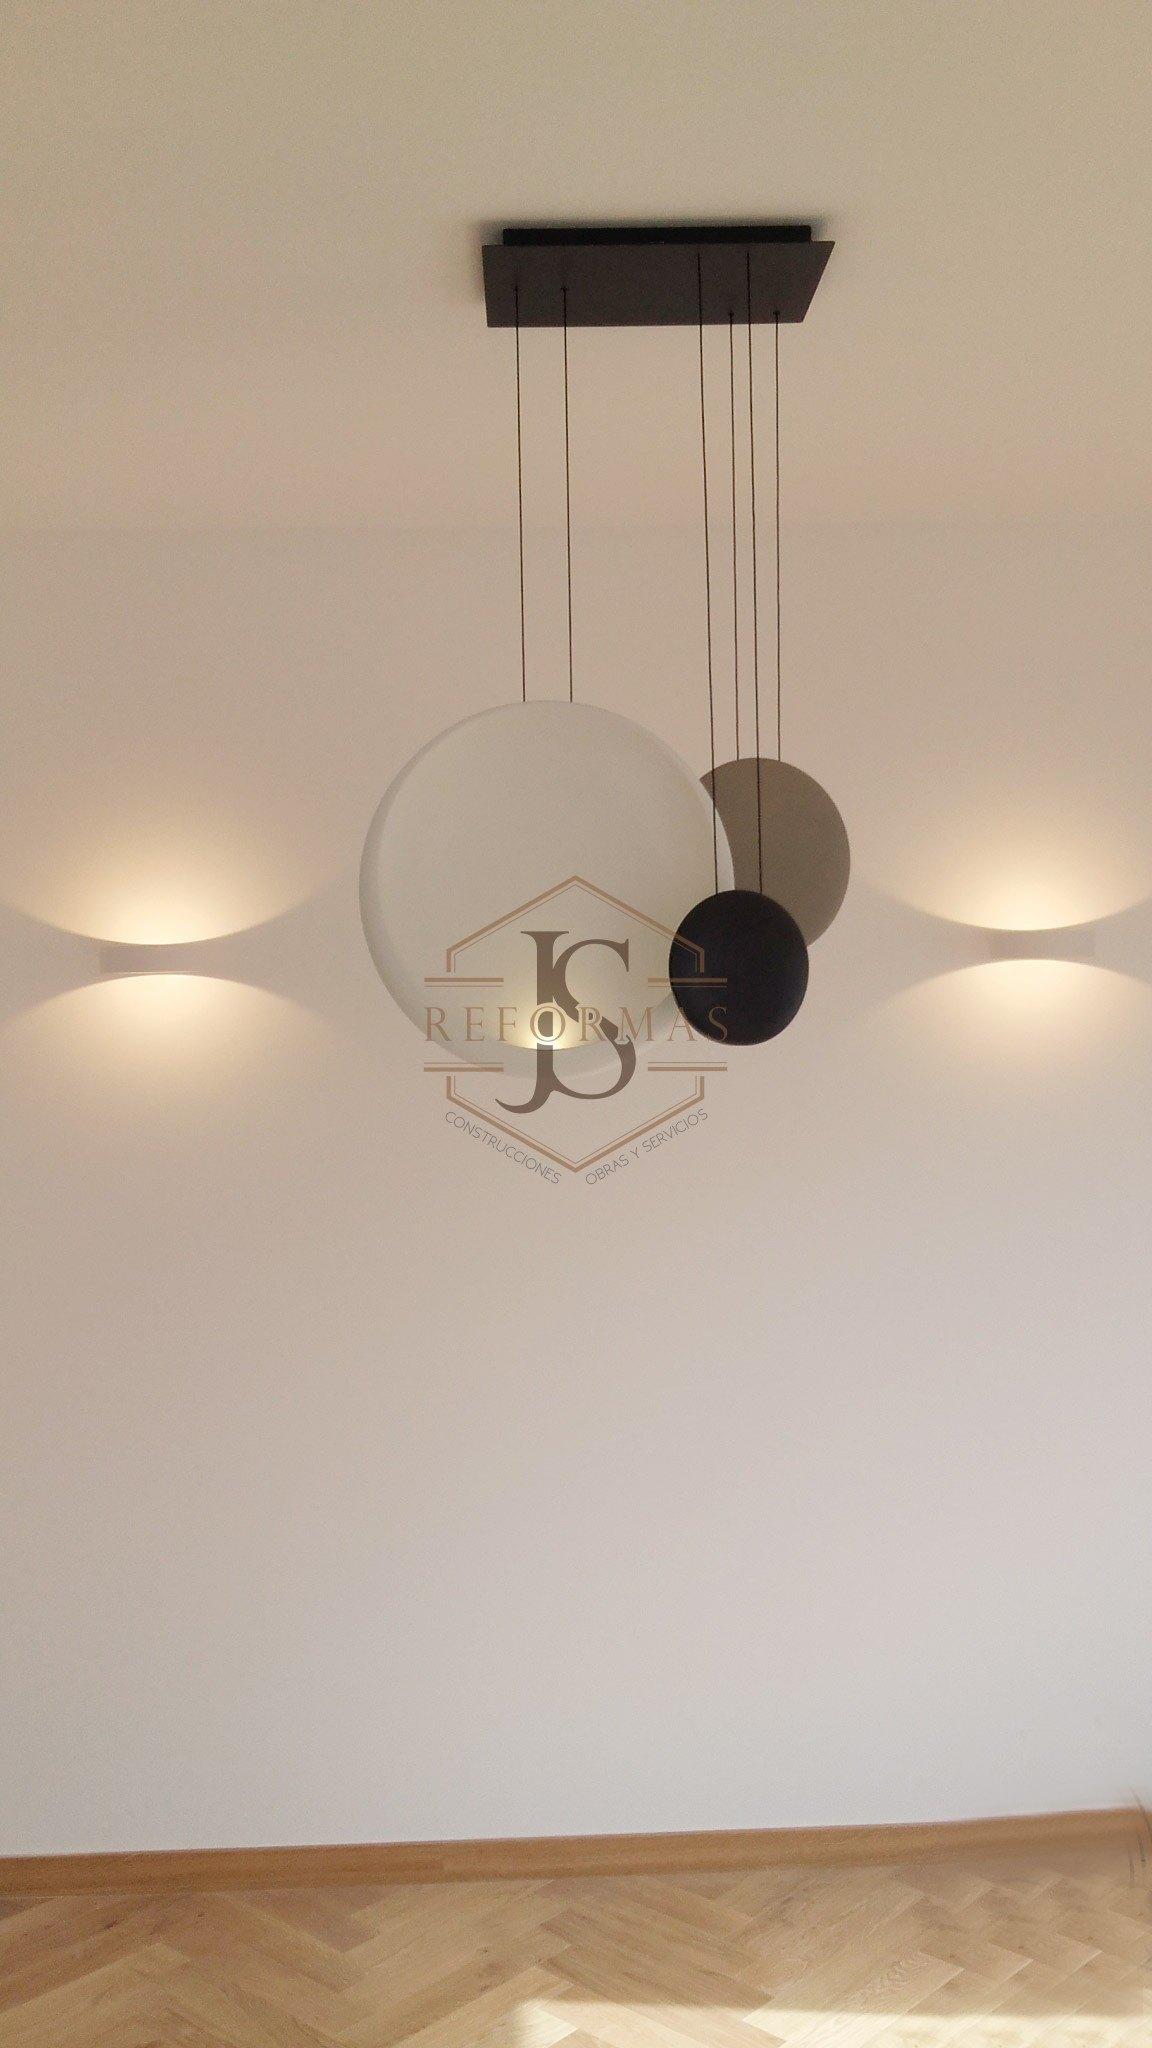 decorasion-lamparas-JS-reformas